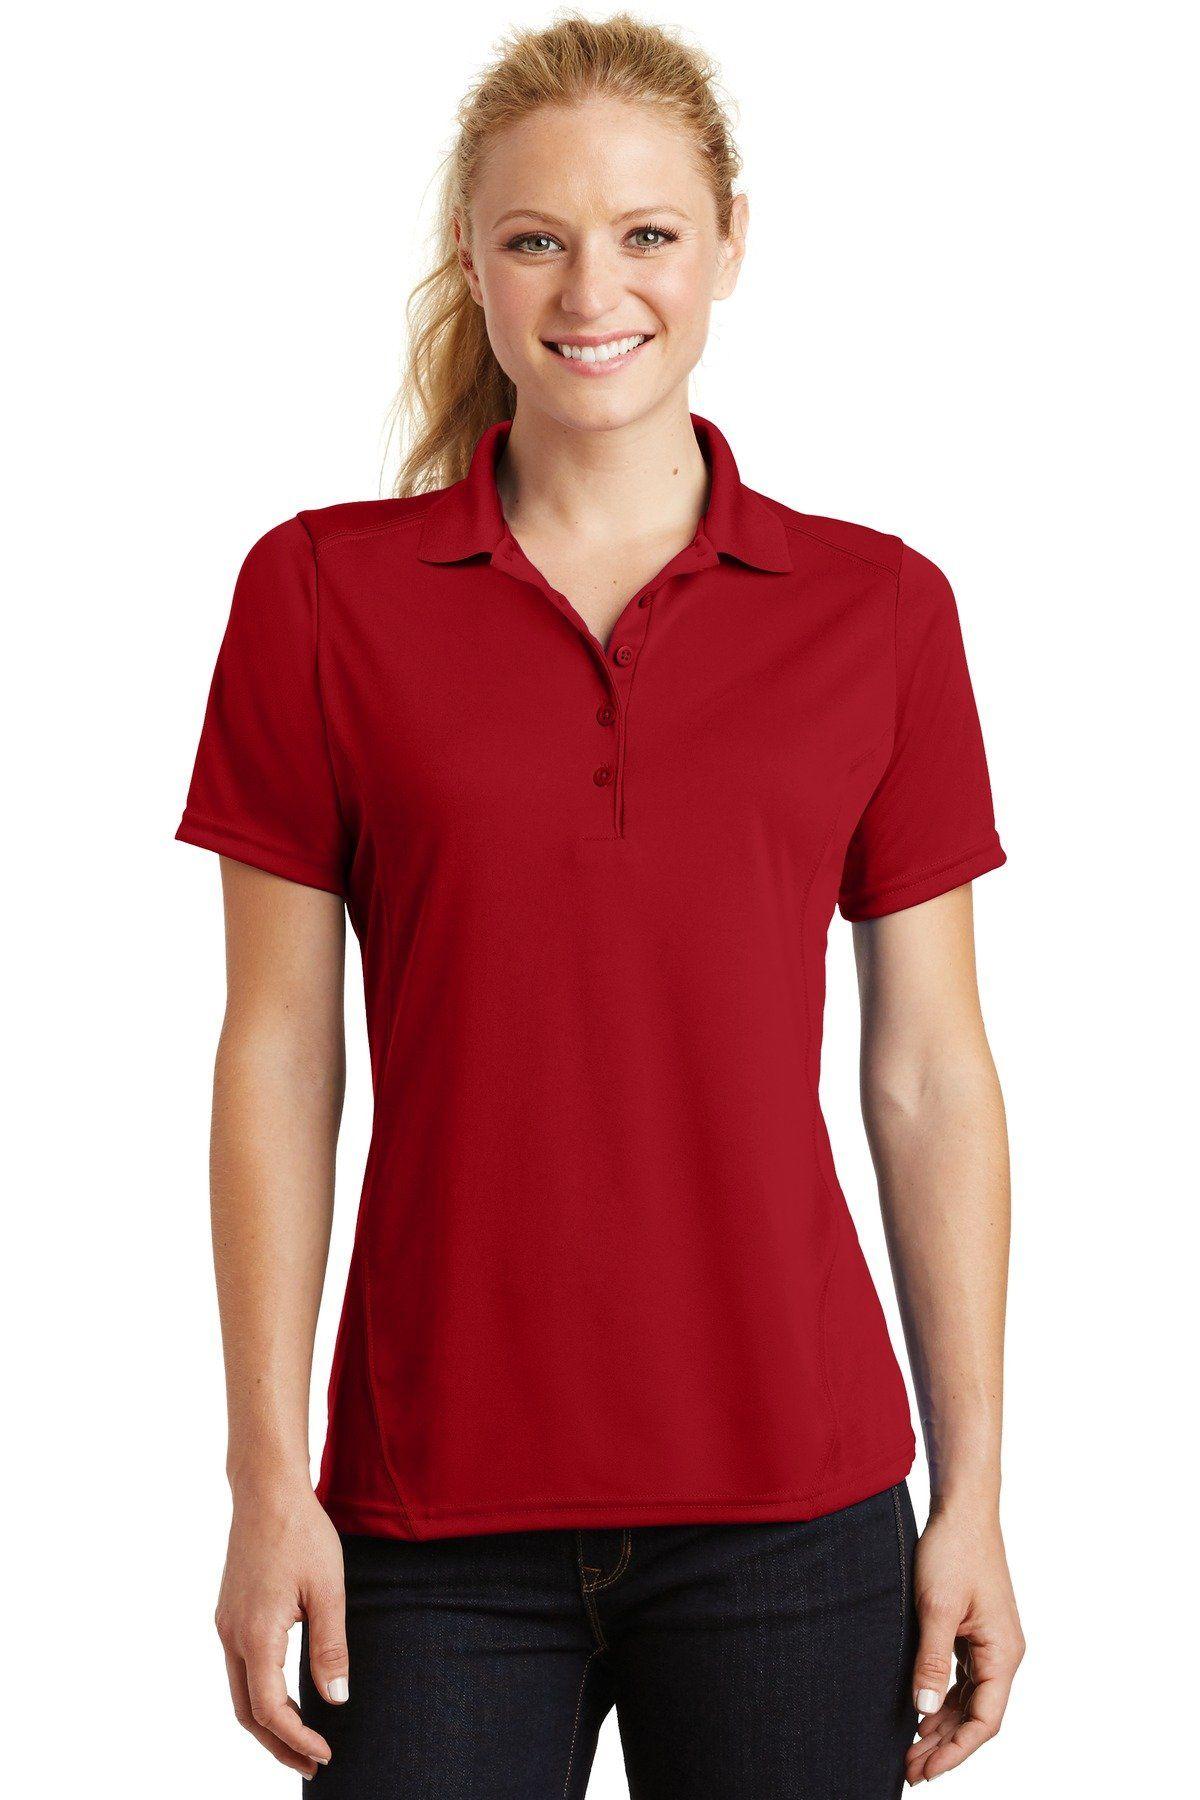 SportTek Ladies Dry Zone Raglan Accent Polo L475 True Red